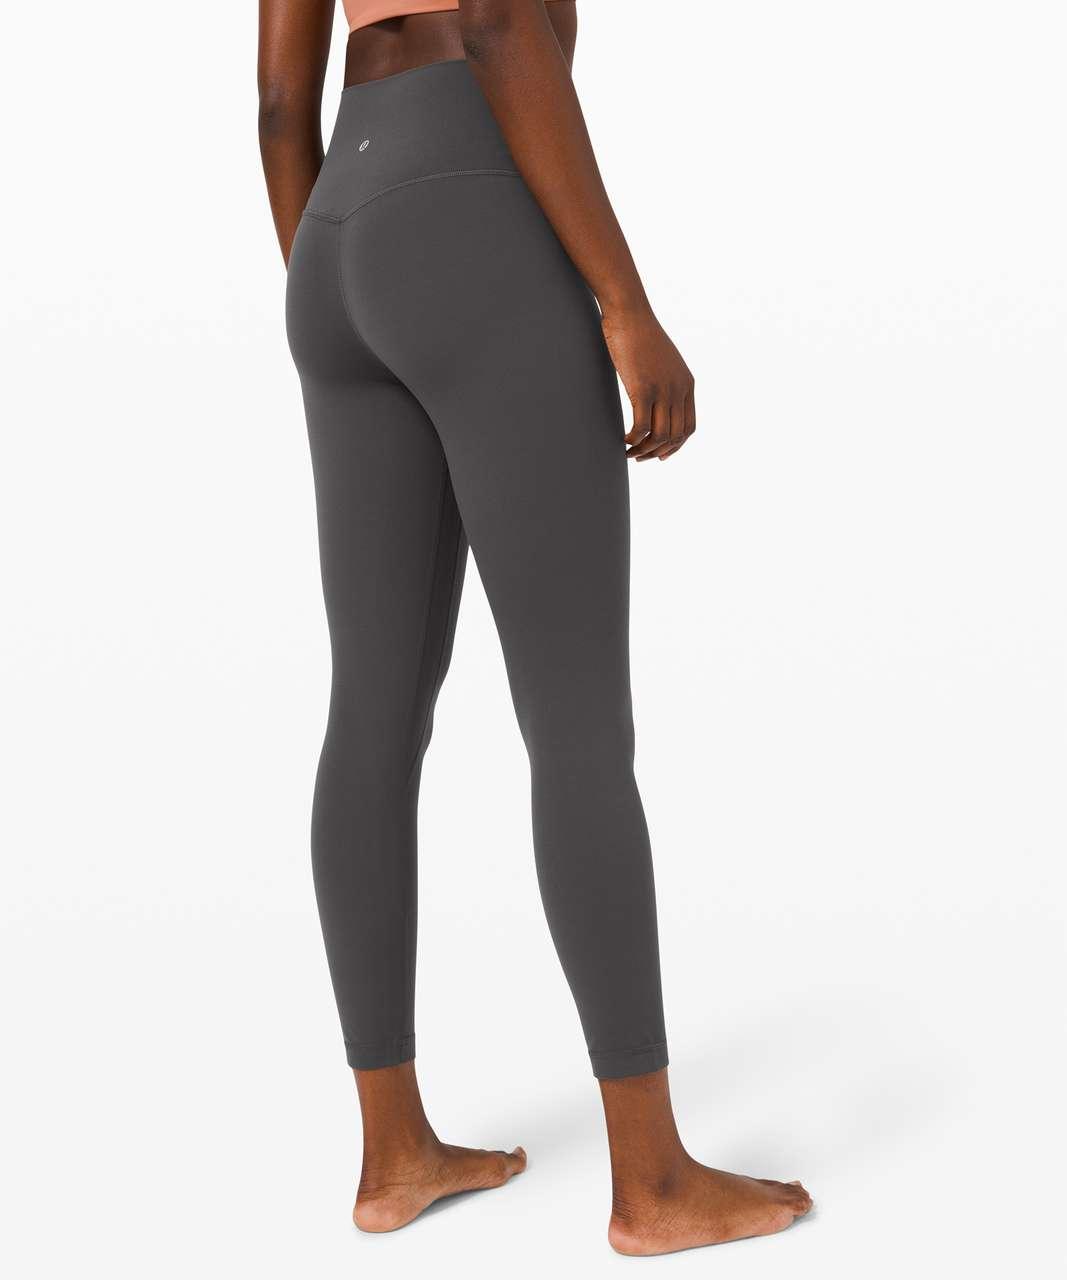 "Lululemon Align Pant 25"" - Graphite Grey"